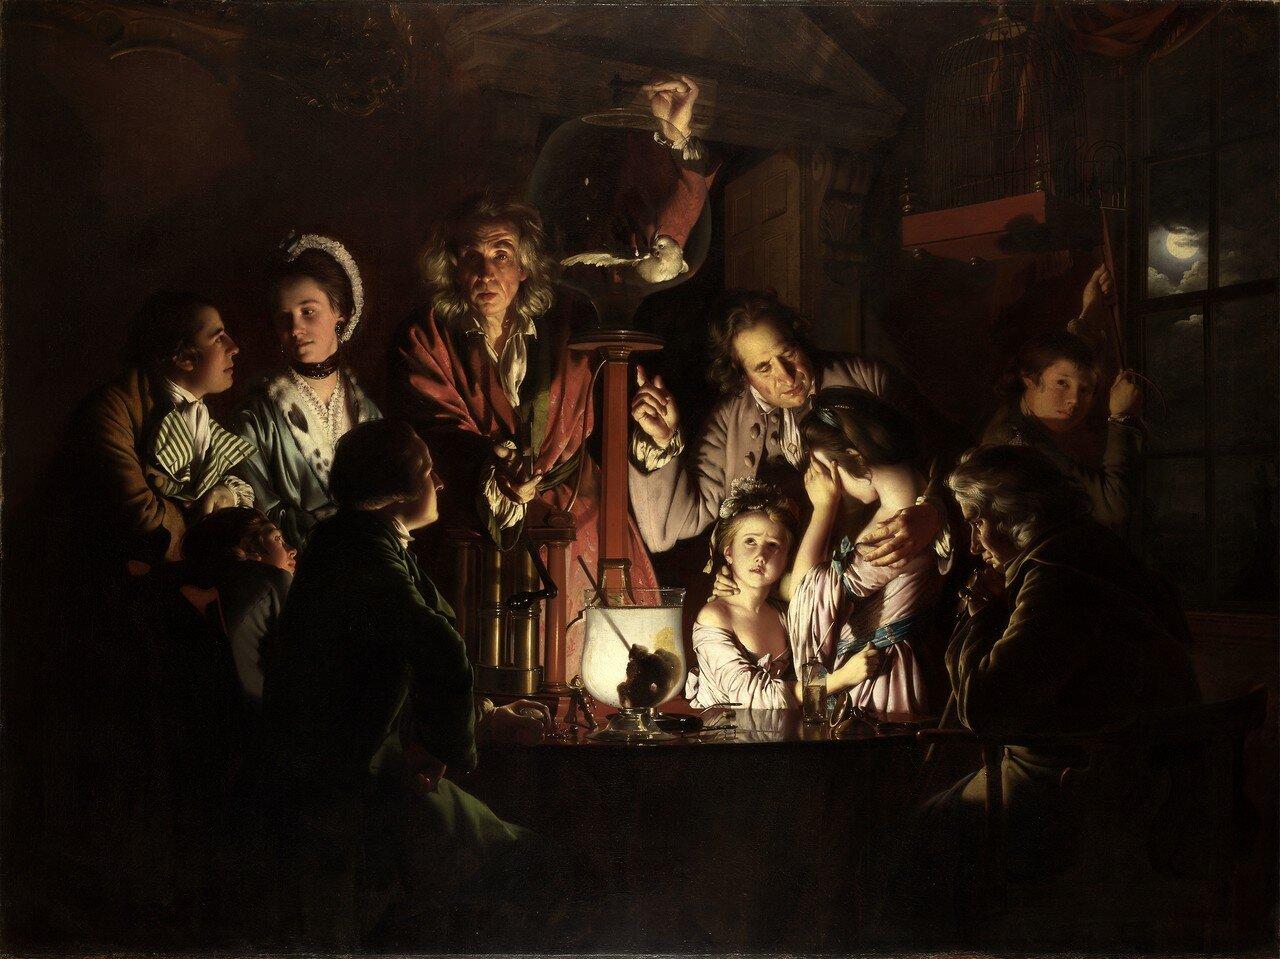 An_Experiment_on_a_Bird_in_an_Air_Pump_by_Joseph_Wright_of_Derby,_1768.jpg